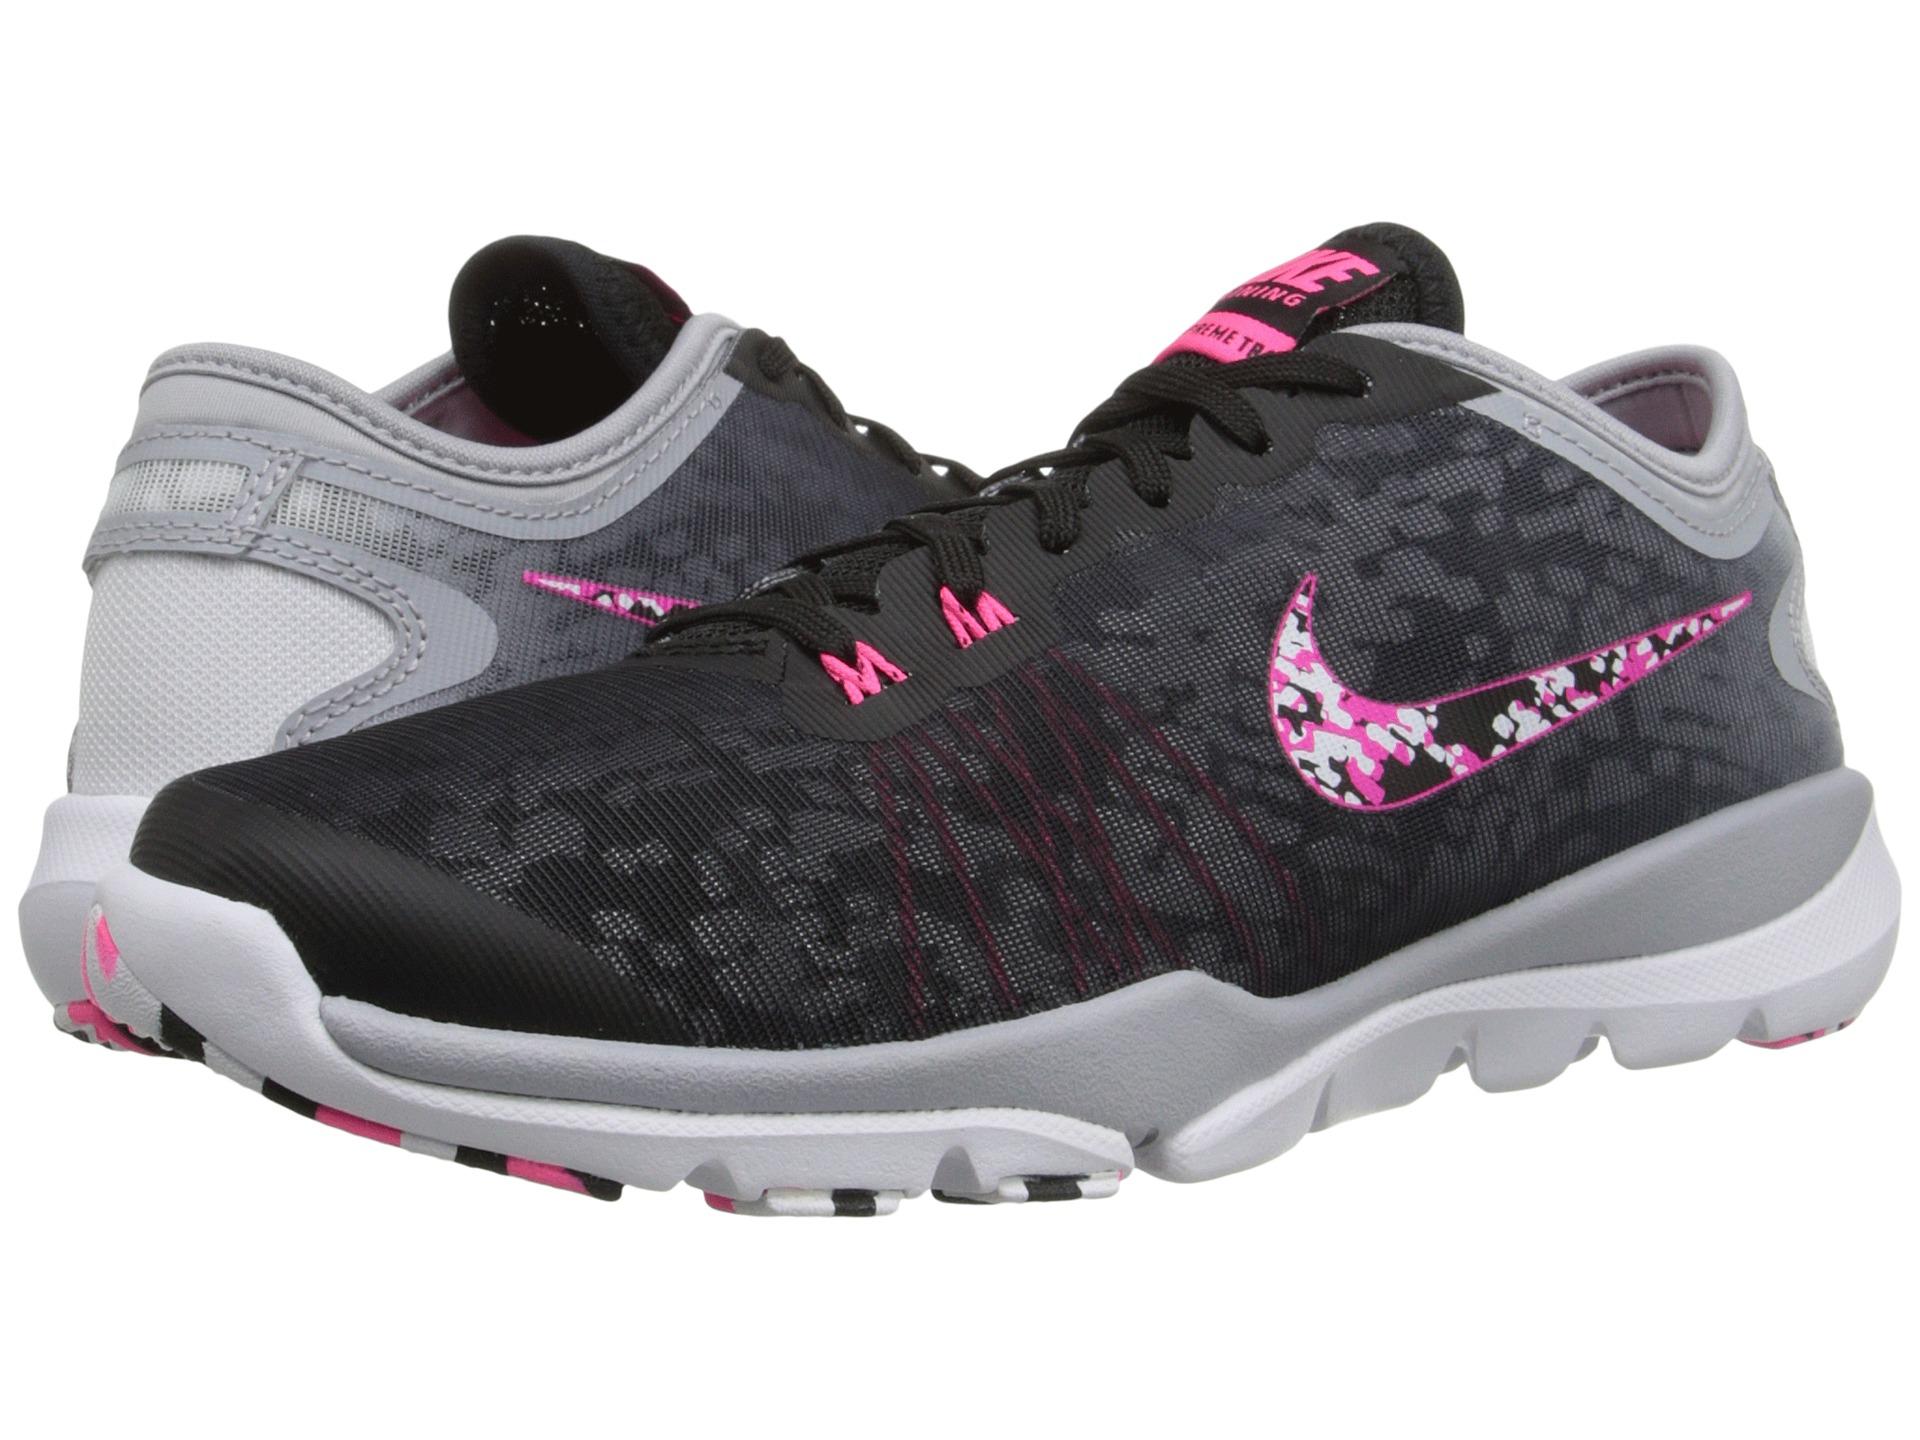 66e5700c9adb Lyst - Nike Flex Supreme Tr 4 Pr in Black